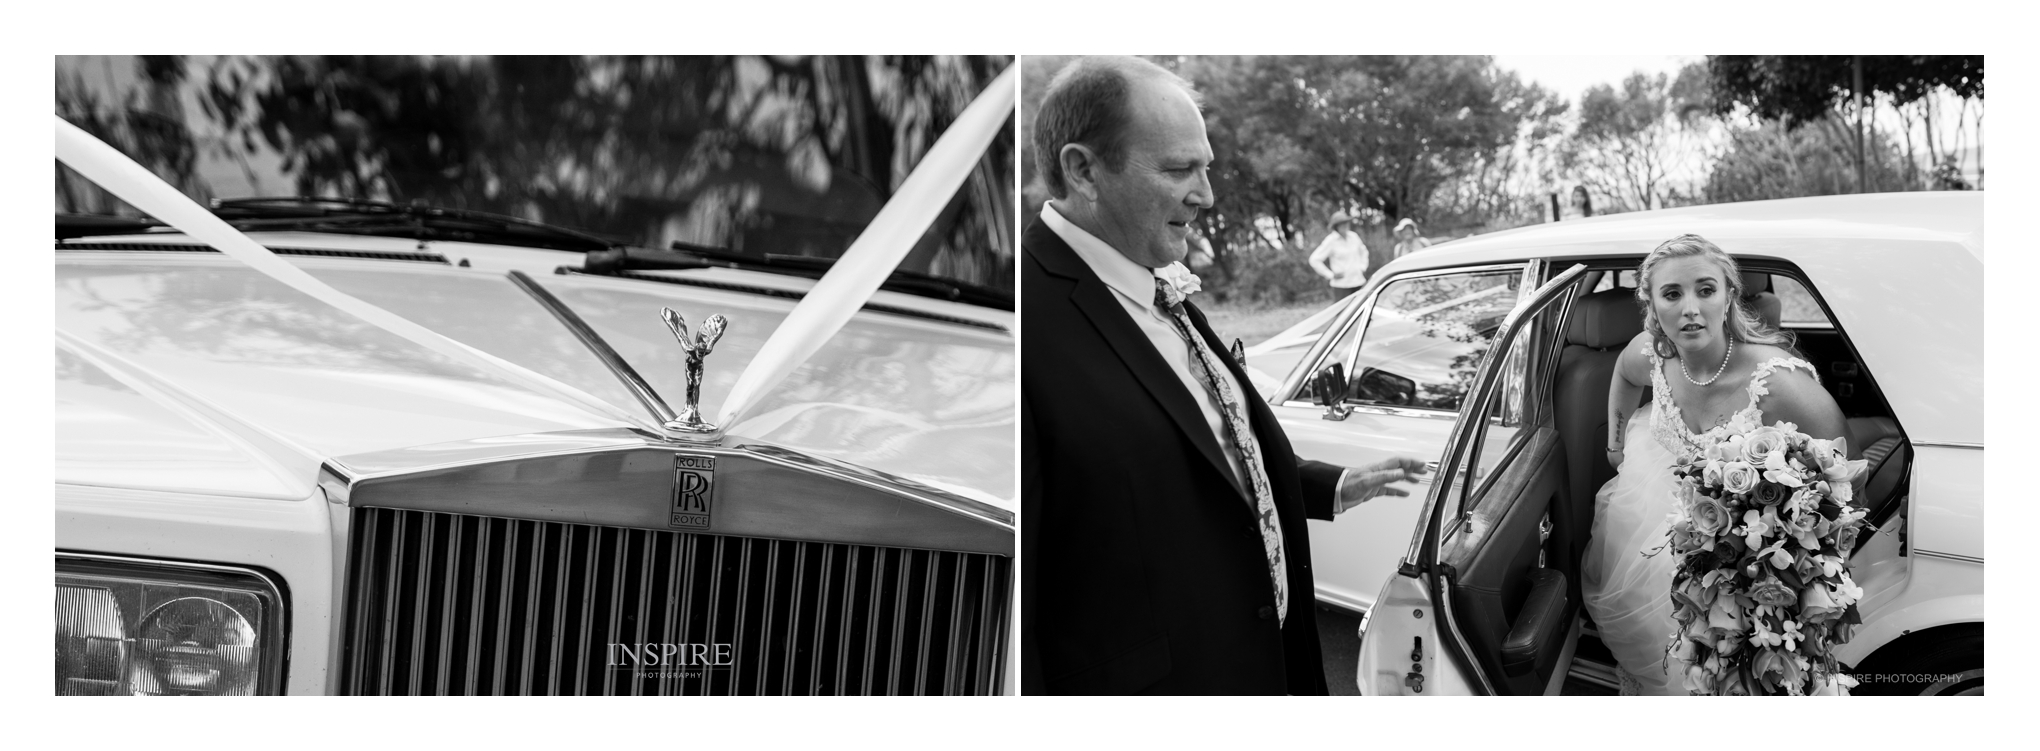 Nick & Bree wedding blog 16.jpg